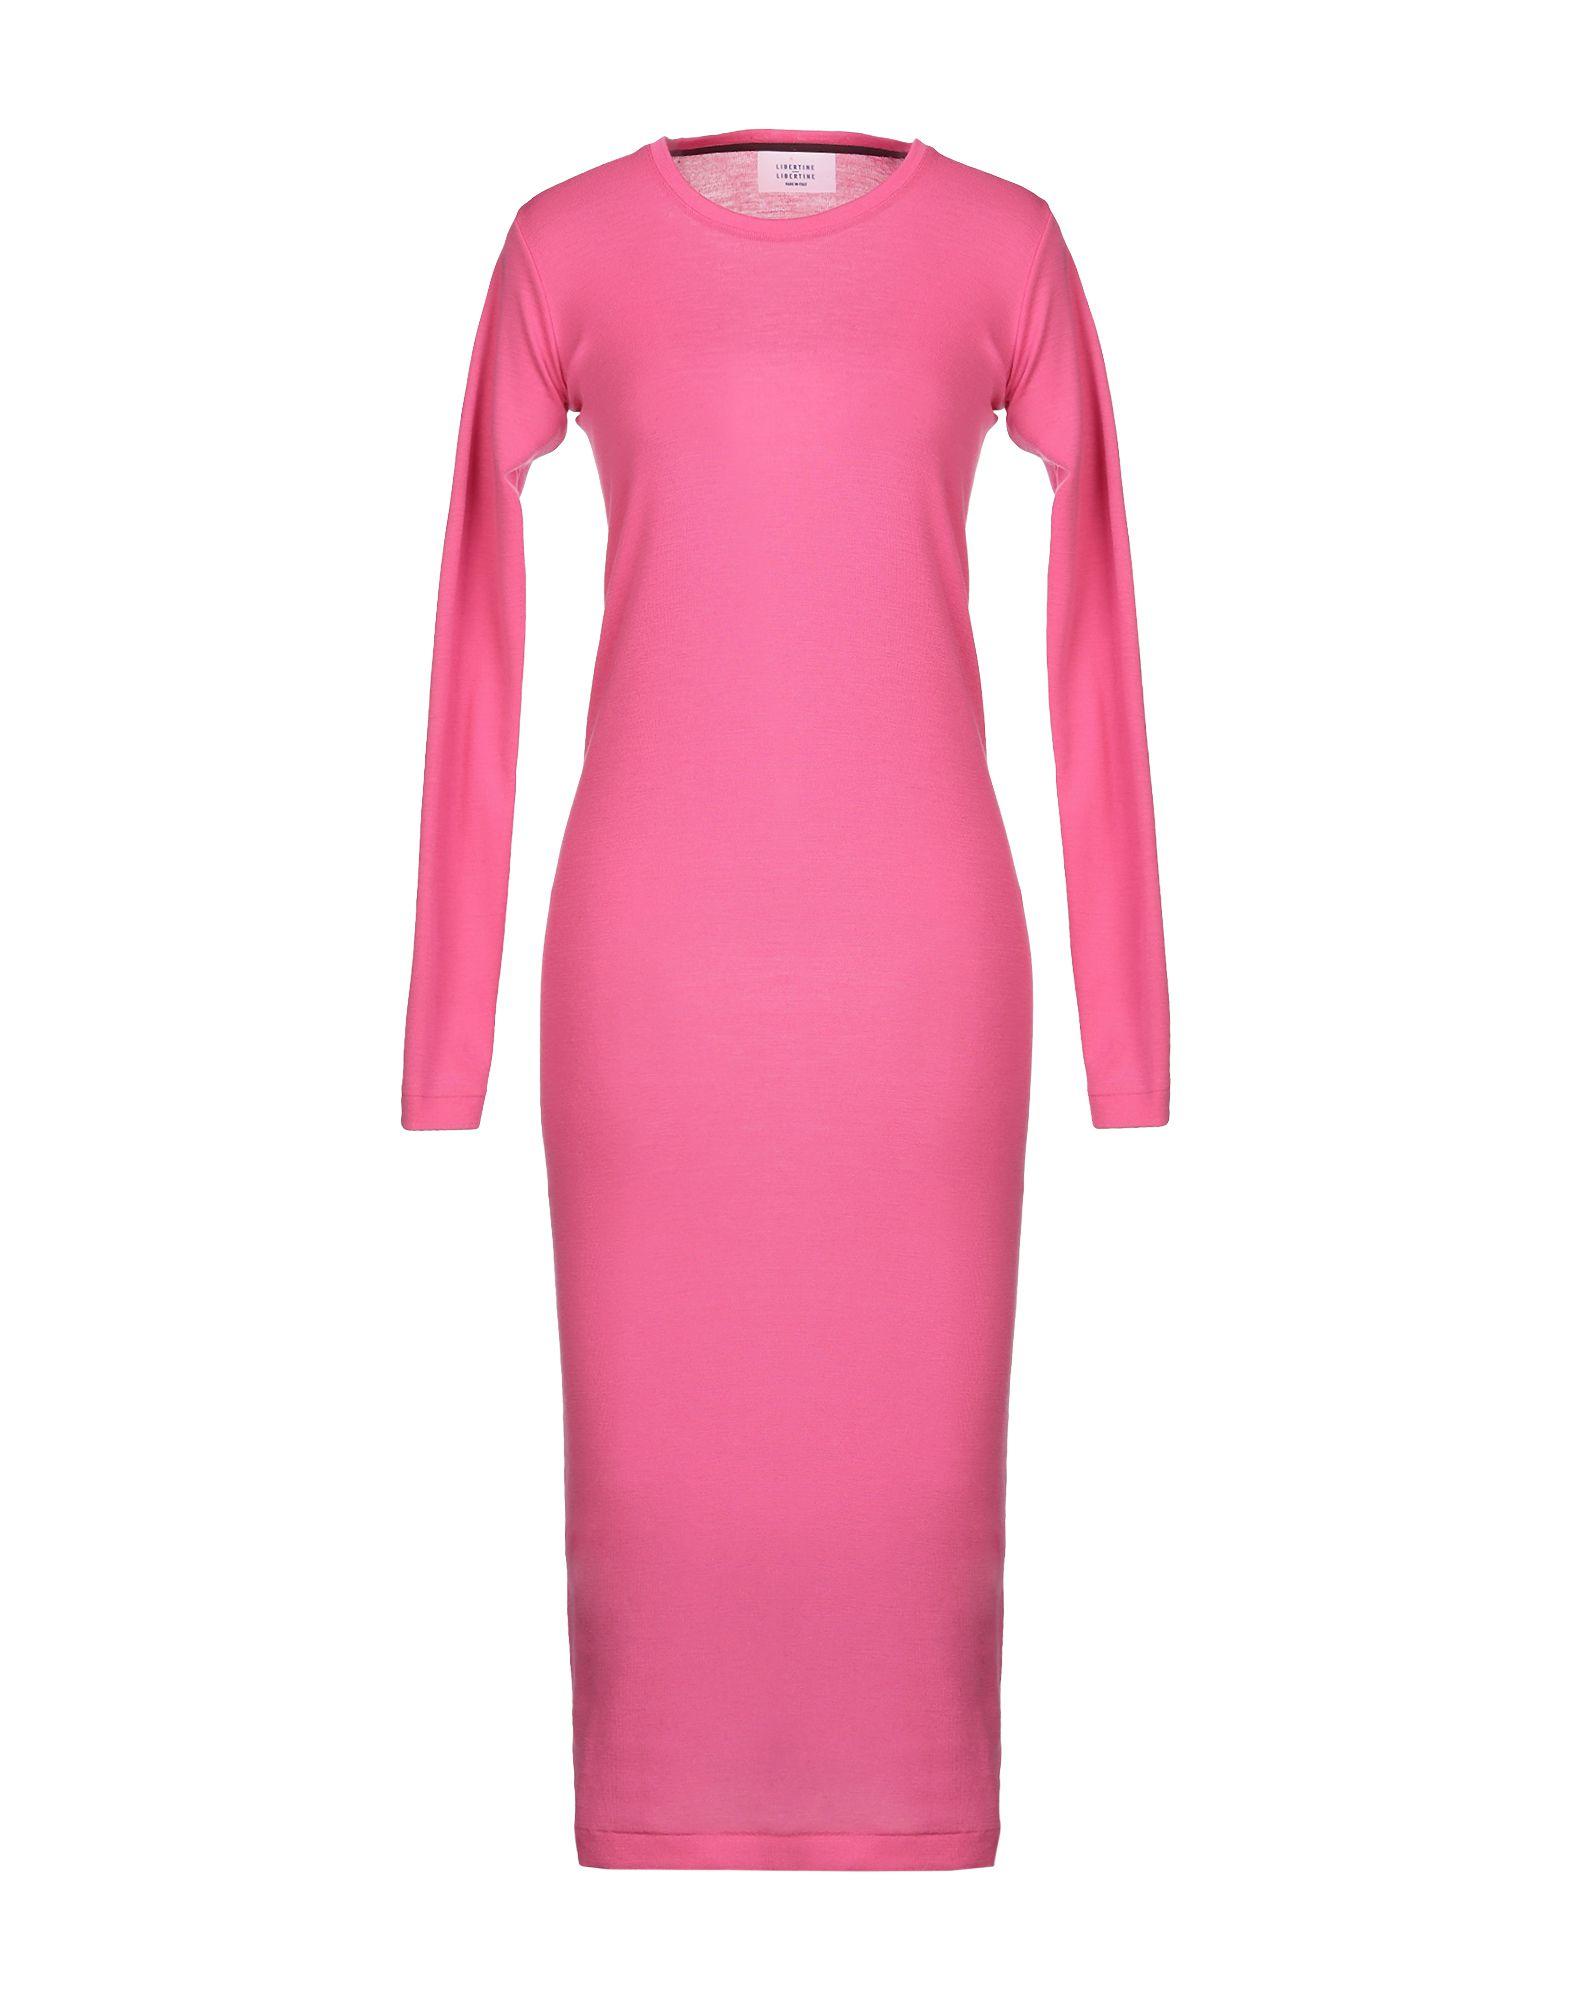 LIBERTINE-LIBERTINE Платье длиной 3/4 carbon fiber front bumper lip splitter spoiler for bmw 3 series gt f34 m sport bumper 4 door 14 17 grey frp 2pc 335i 340i gt